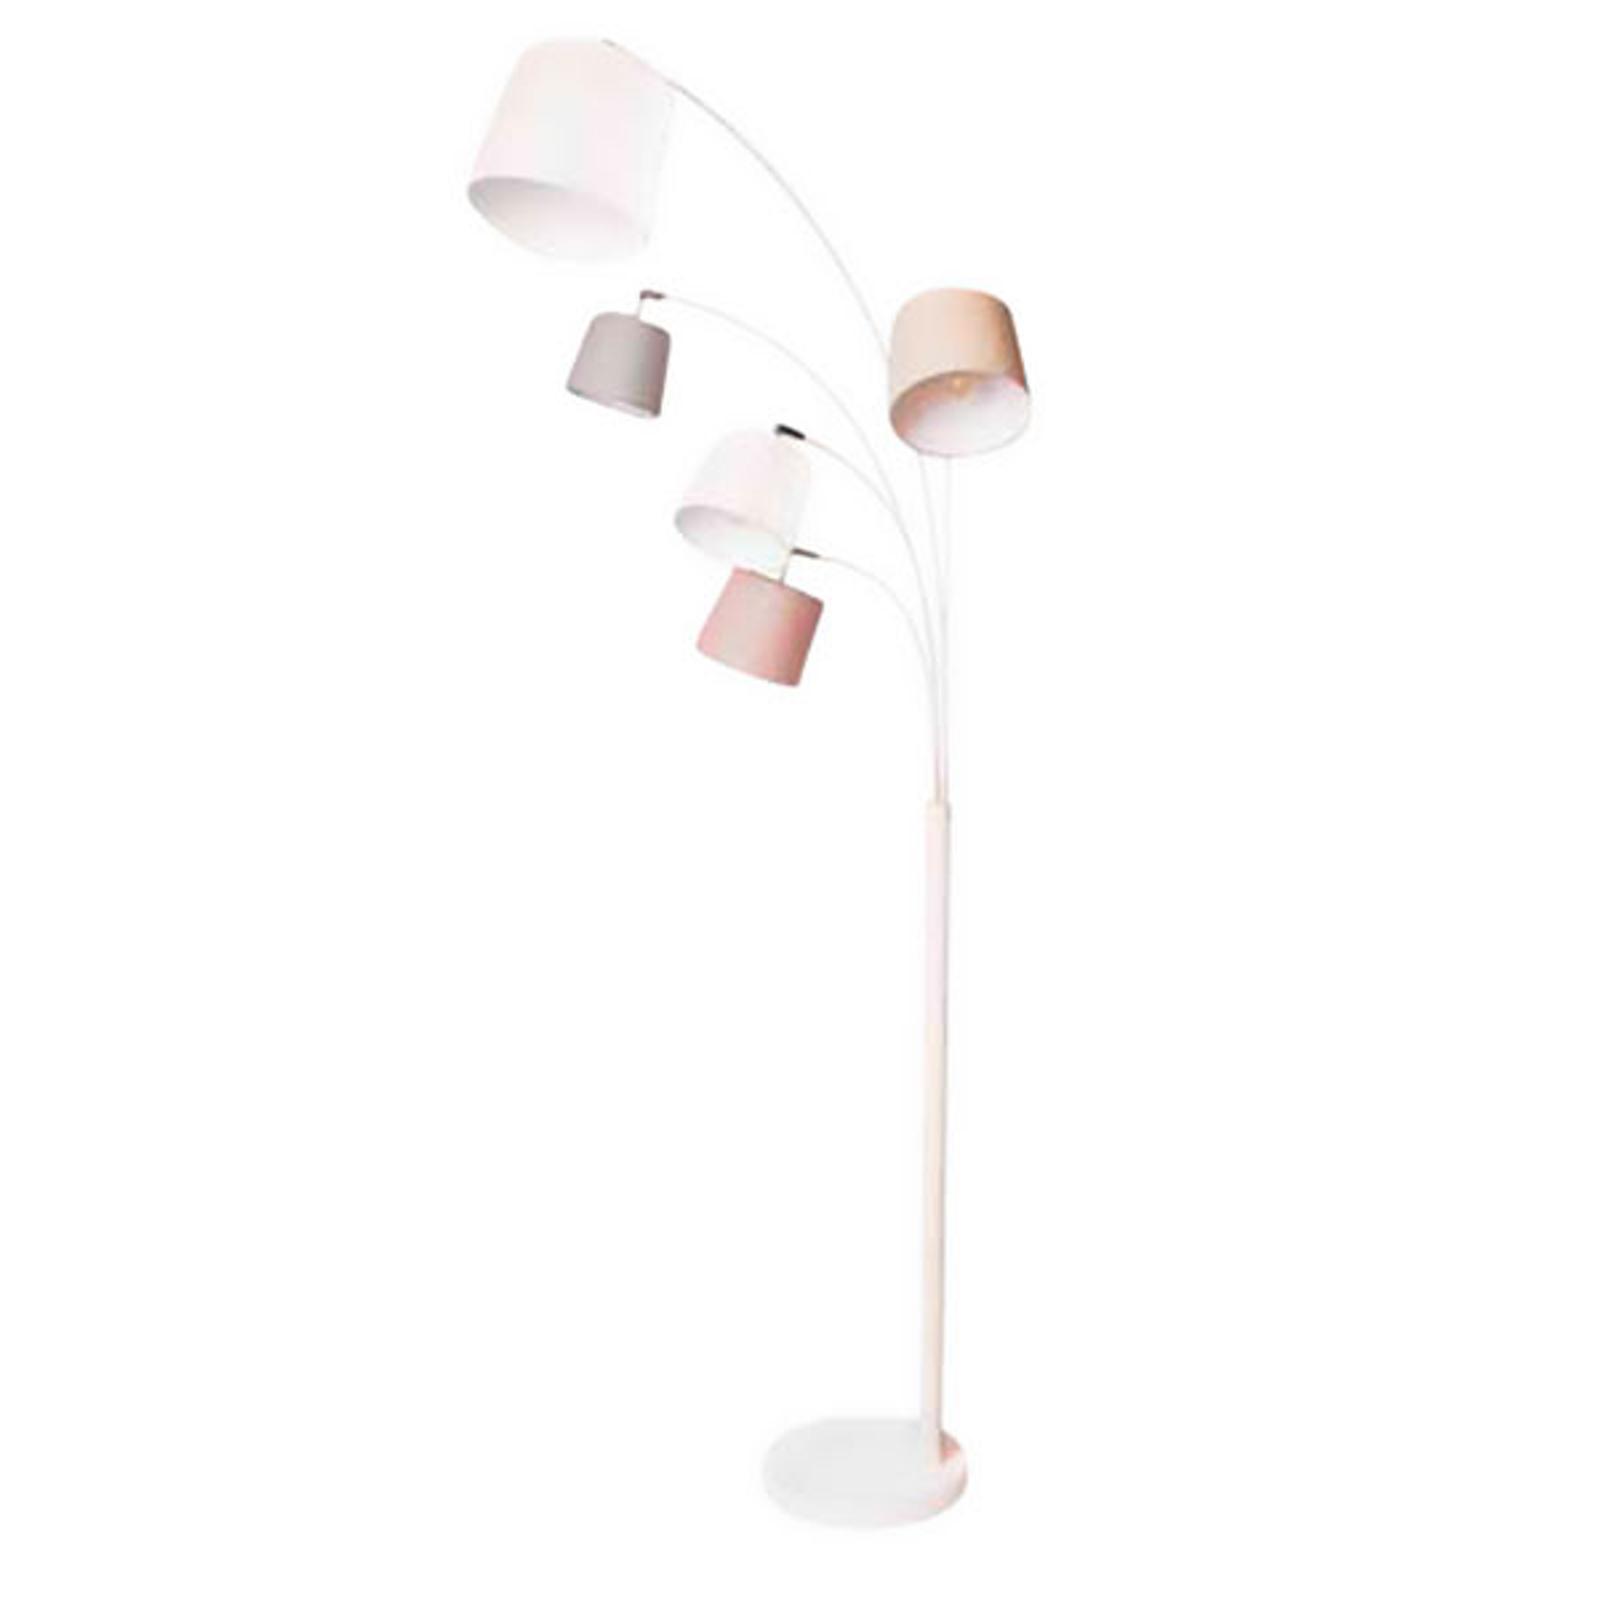 By Rydéns Foggy lámpara de pie, 5 pantallas blanco